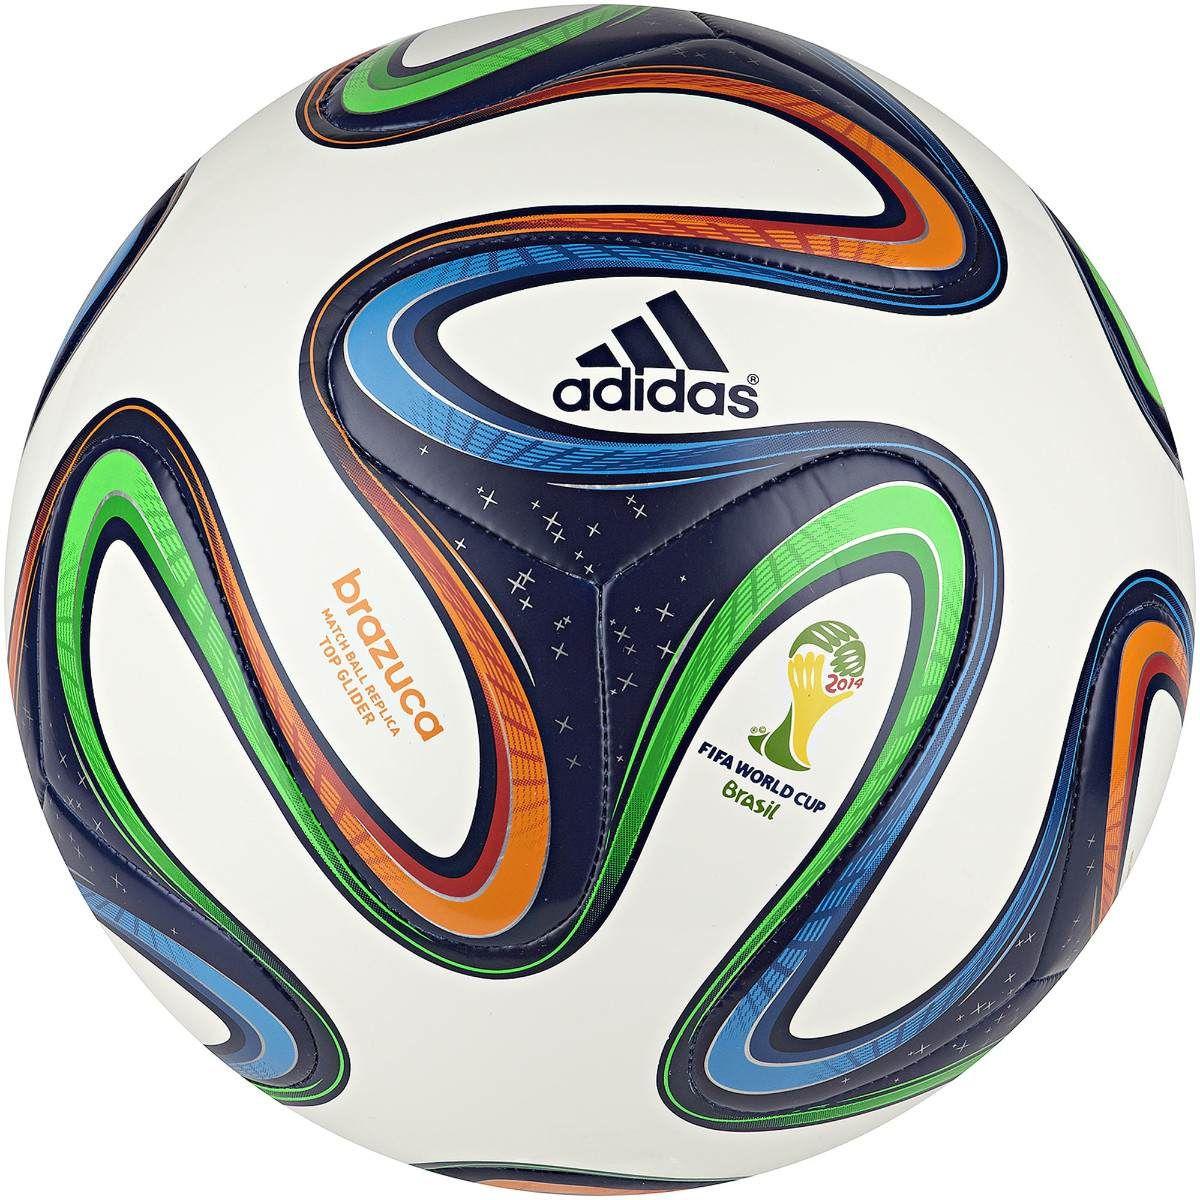 balon-futbol-adidas-brazuca-2014